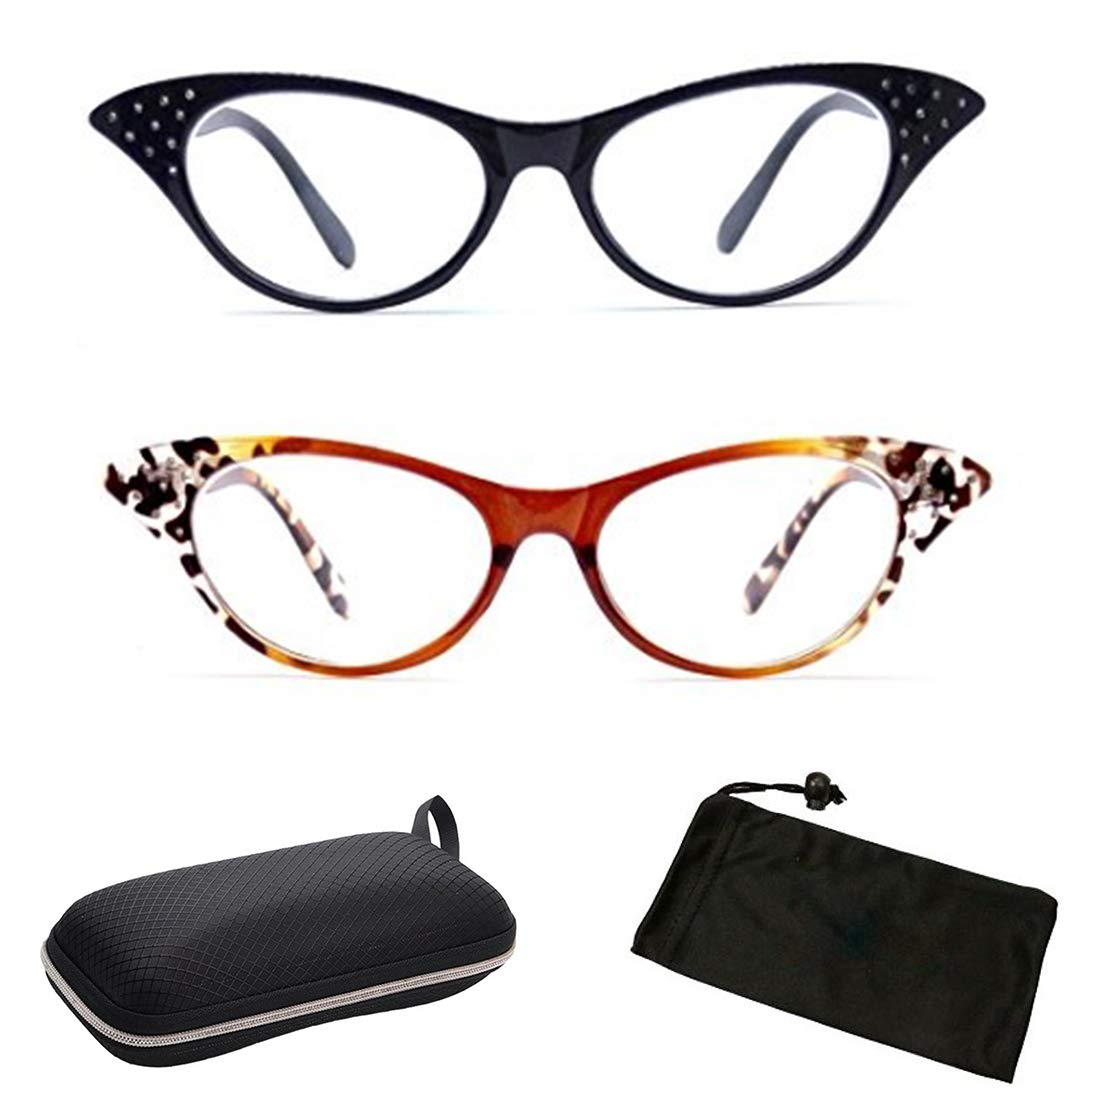 66f203d1f46 Cateye Retro Readers Reading Glasses for Women Female with Free Hard Case  (Plastic Frame) (Oval 70 s 80 s Shape) (Designer